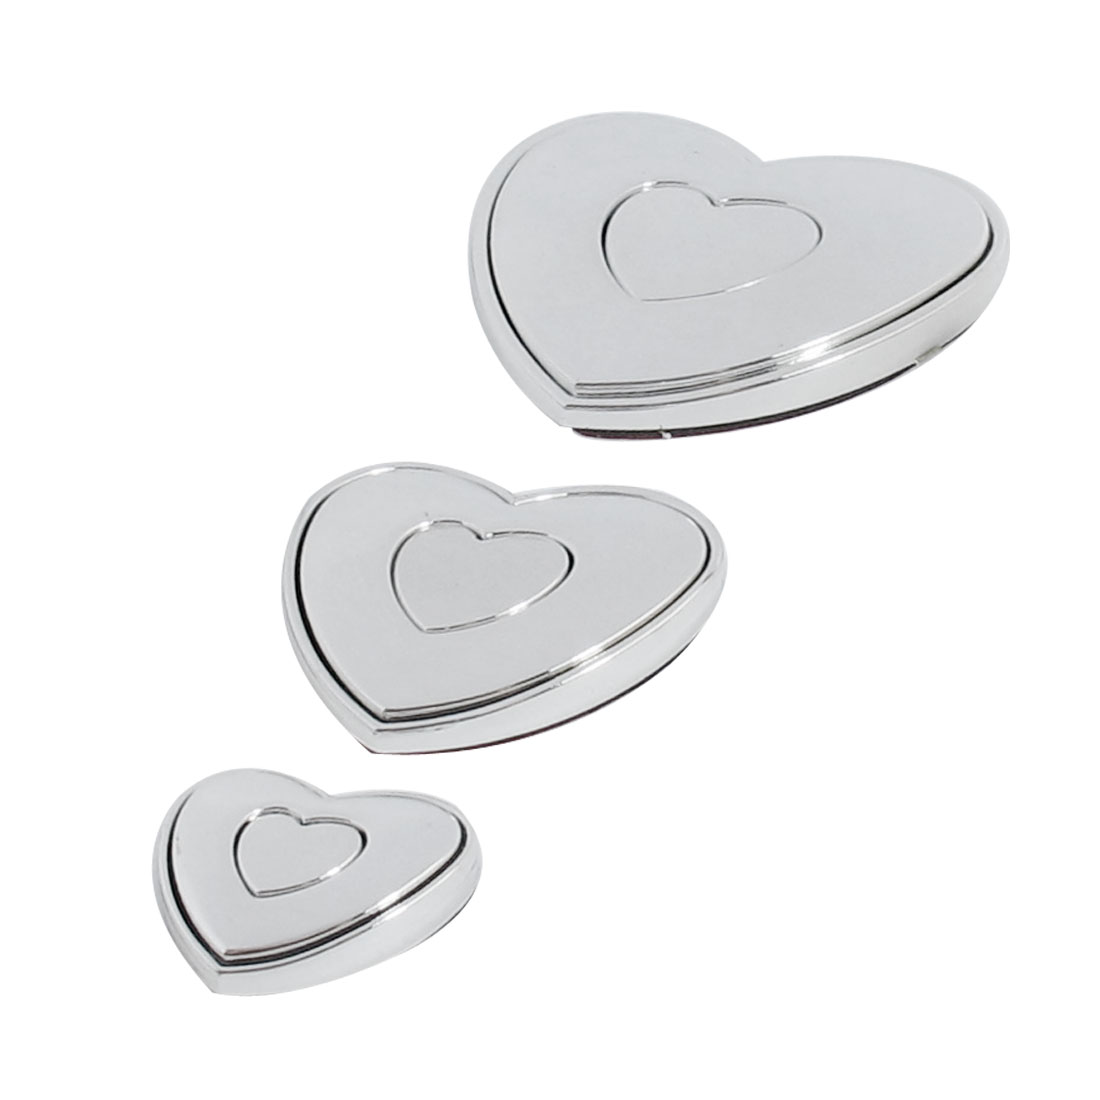 3 Pcs Silver Tone Plastic Heart-shaped Automobile Auto Emblem Door Car Badge Stickers